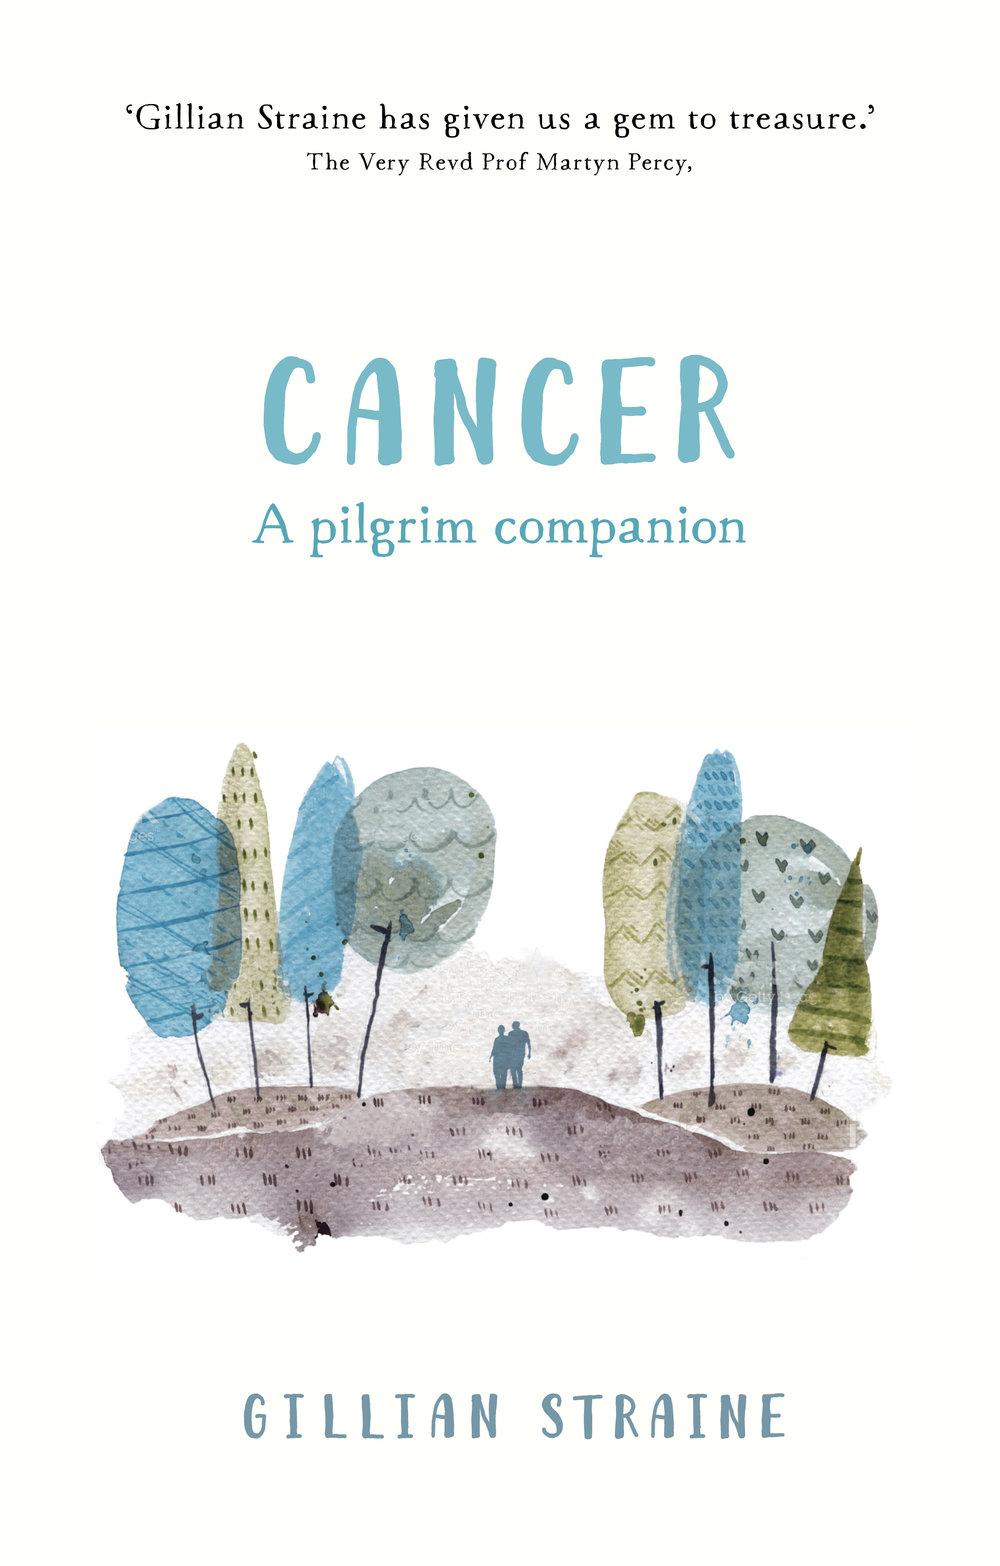 cancer a pilgrim companion FC (2).jpg